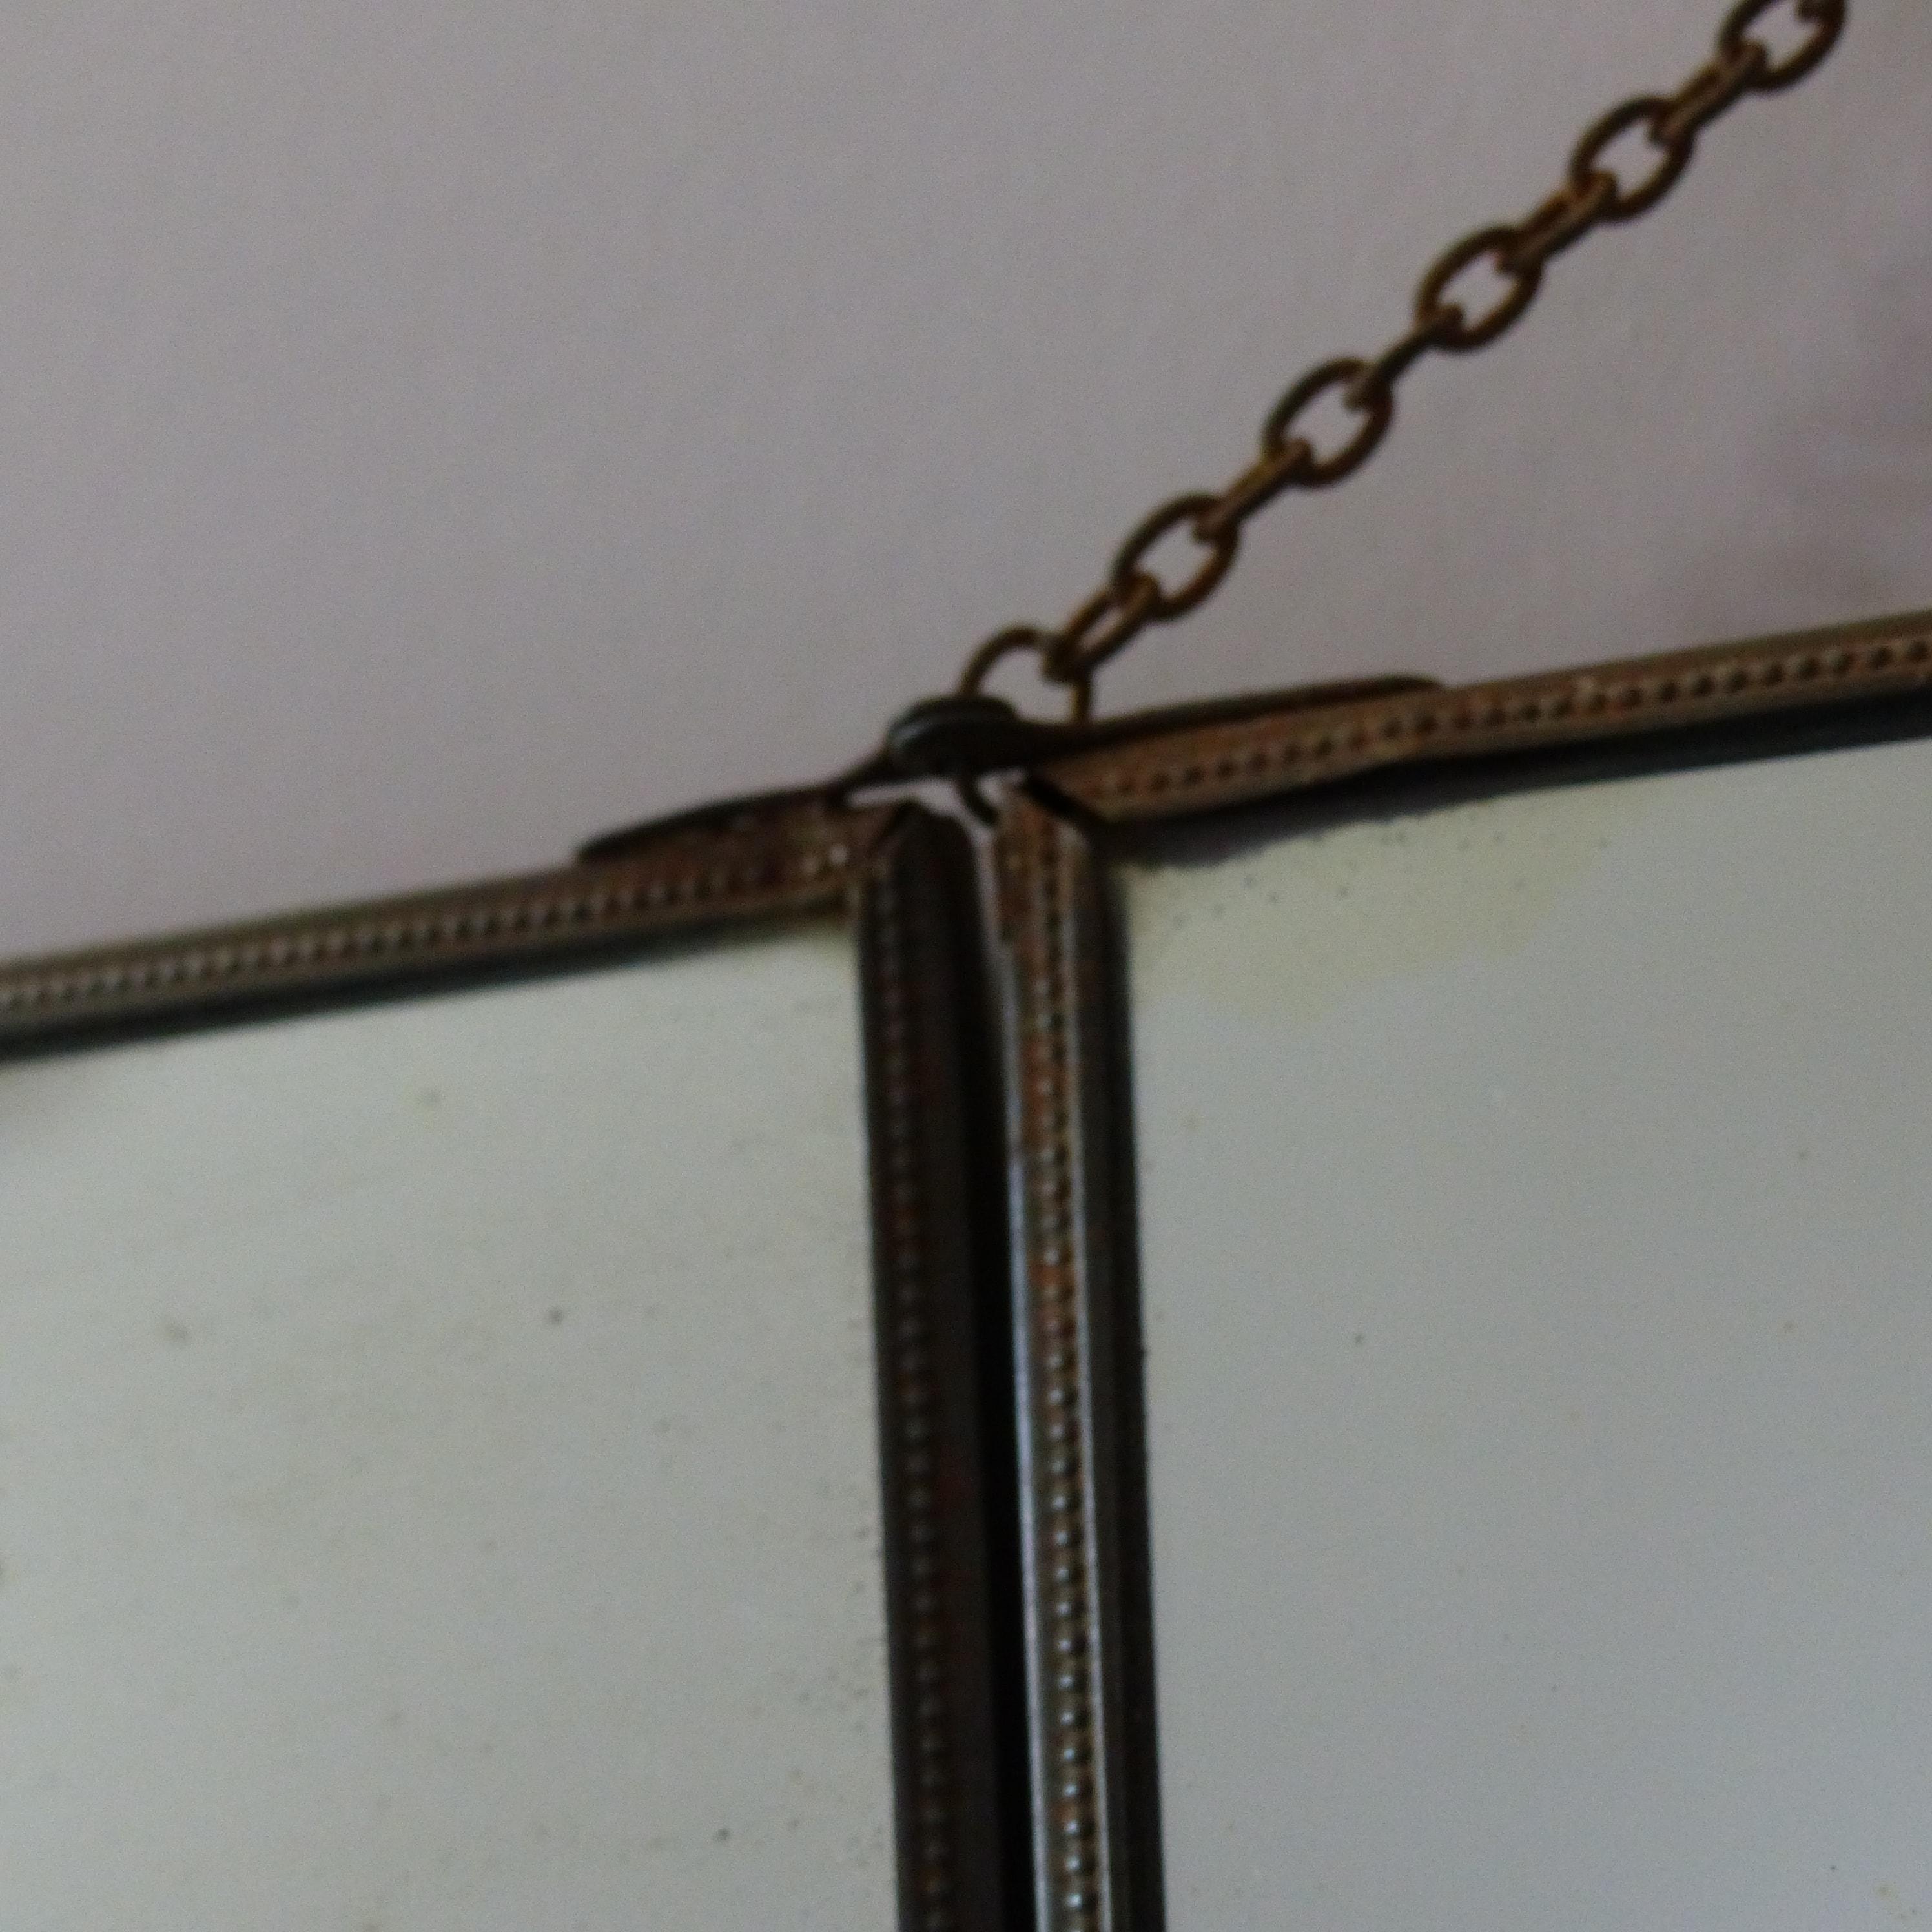 Miroir triptyque de barbier ancien miroir triptyque de for Miroir triptyque barbier